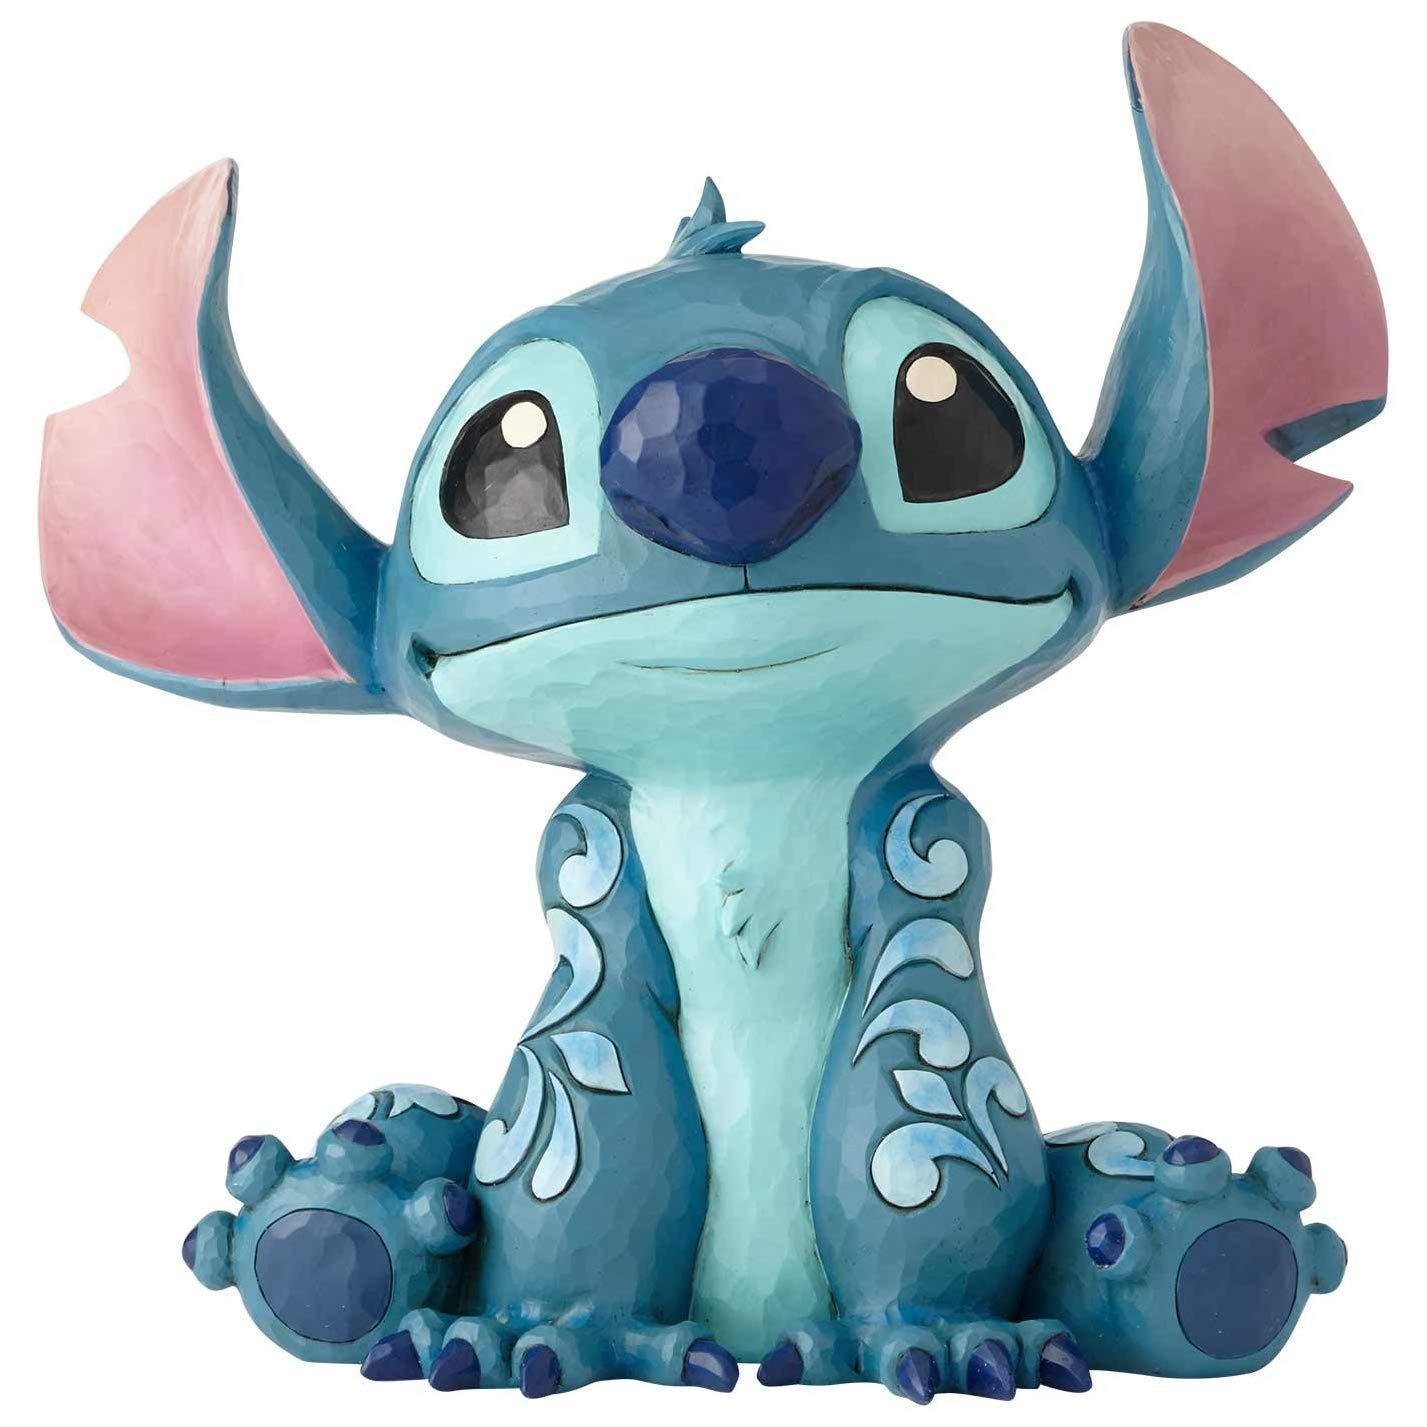 Disney Traditions Big Trouble Stitch Statement Figurine Resin Multi-Colour 6 x 23 x 36 cm @ Amazon £62.99 Delivered